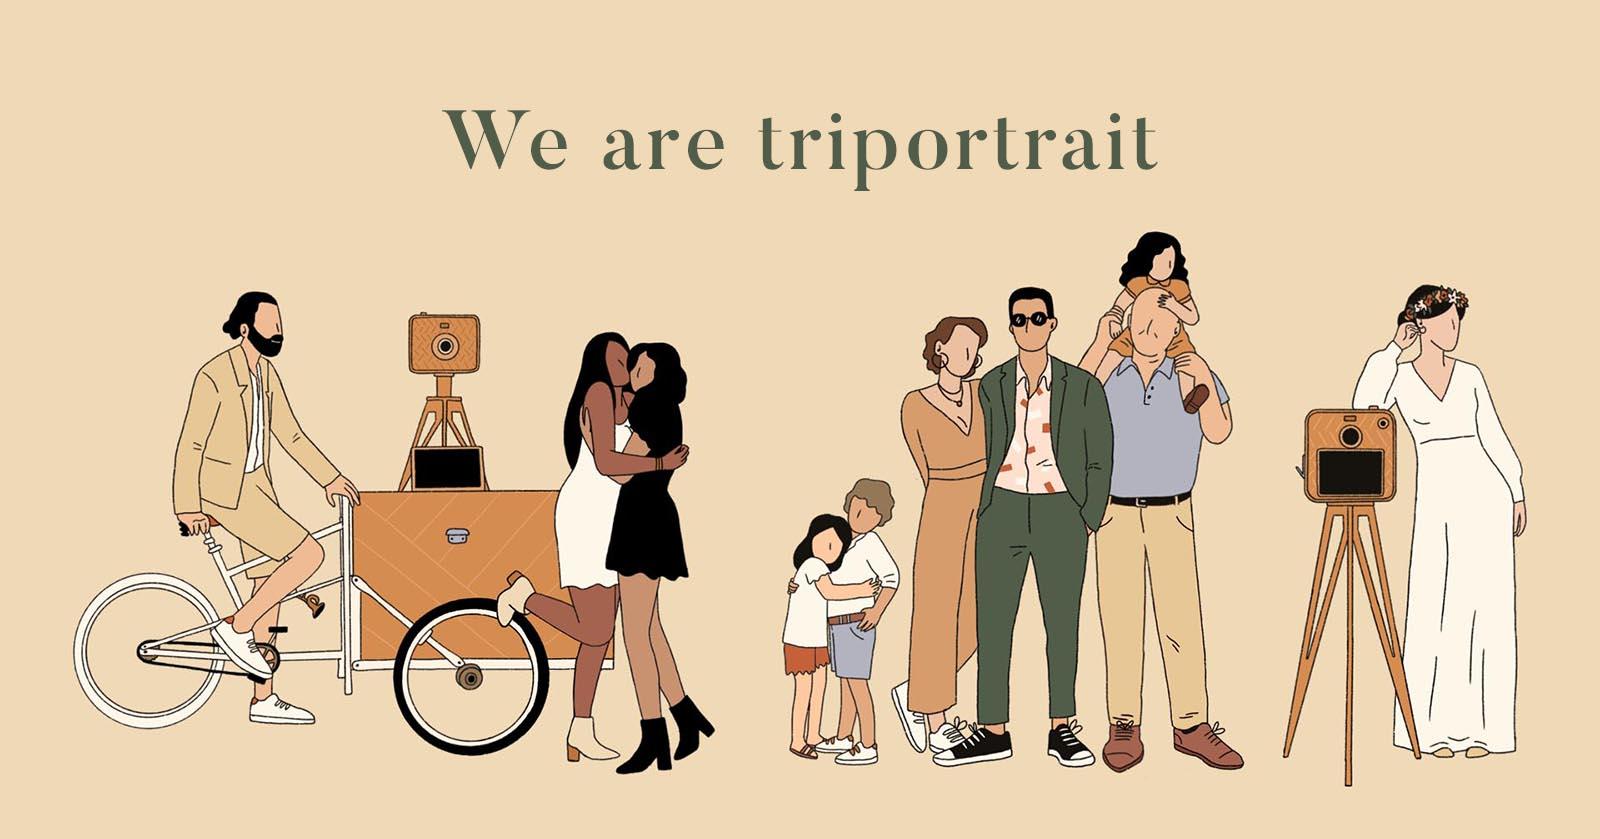 we are triportrait